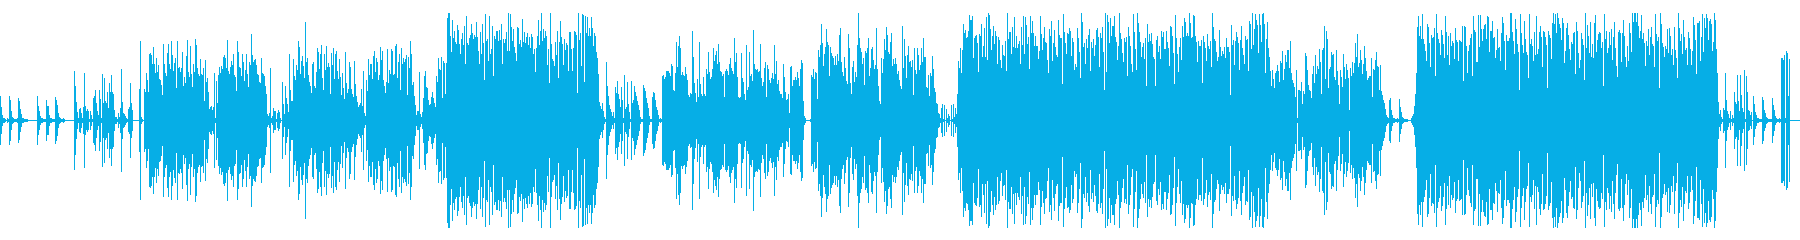 Kawaii系エレクトロ楽曲です。の再生済みの波形